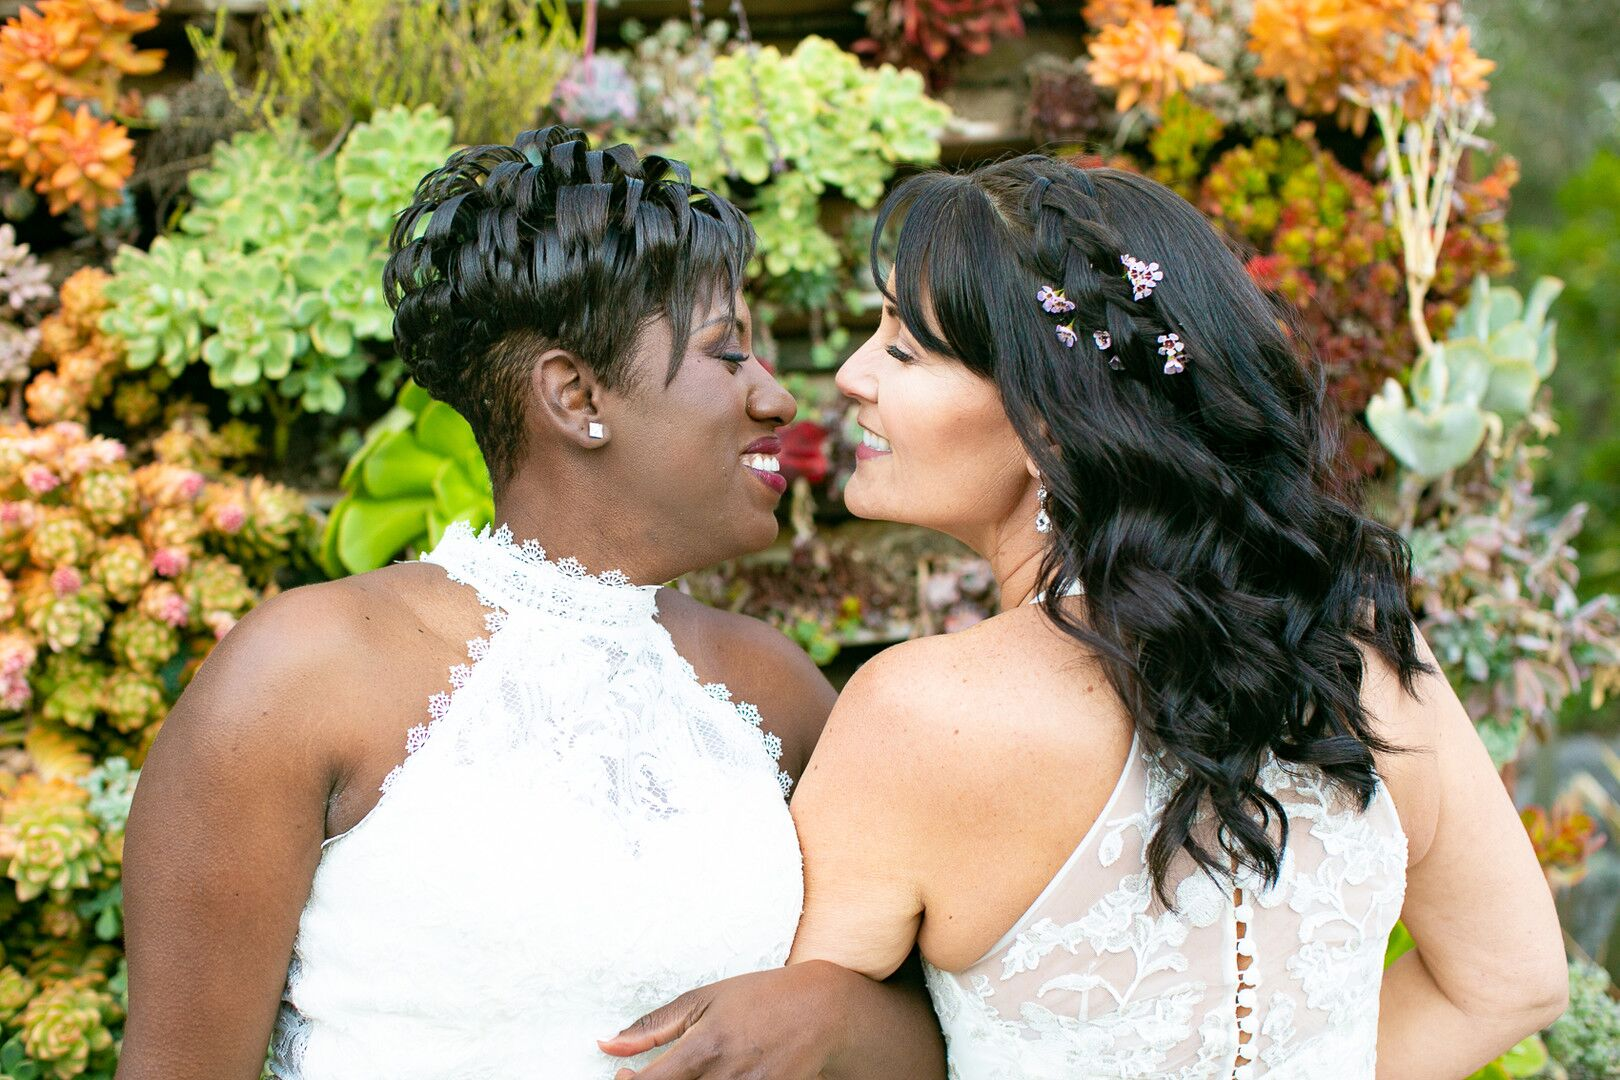 www.santabarbarawedding.com | Venue: The Casitas of Arroyo Grande | Photographer: Renoda Campbell Photography | Second Shooter: John Patrick Images |  Brides Loving Look